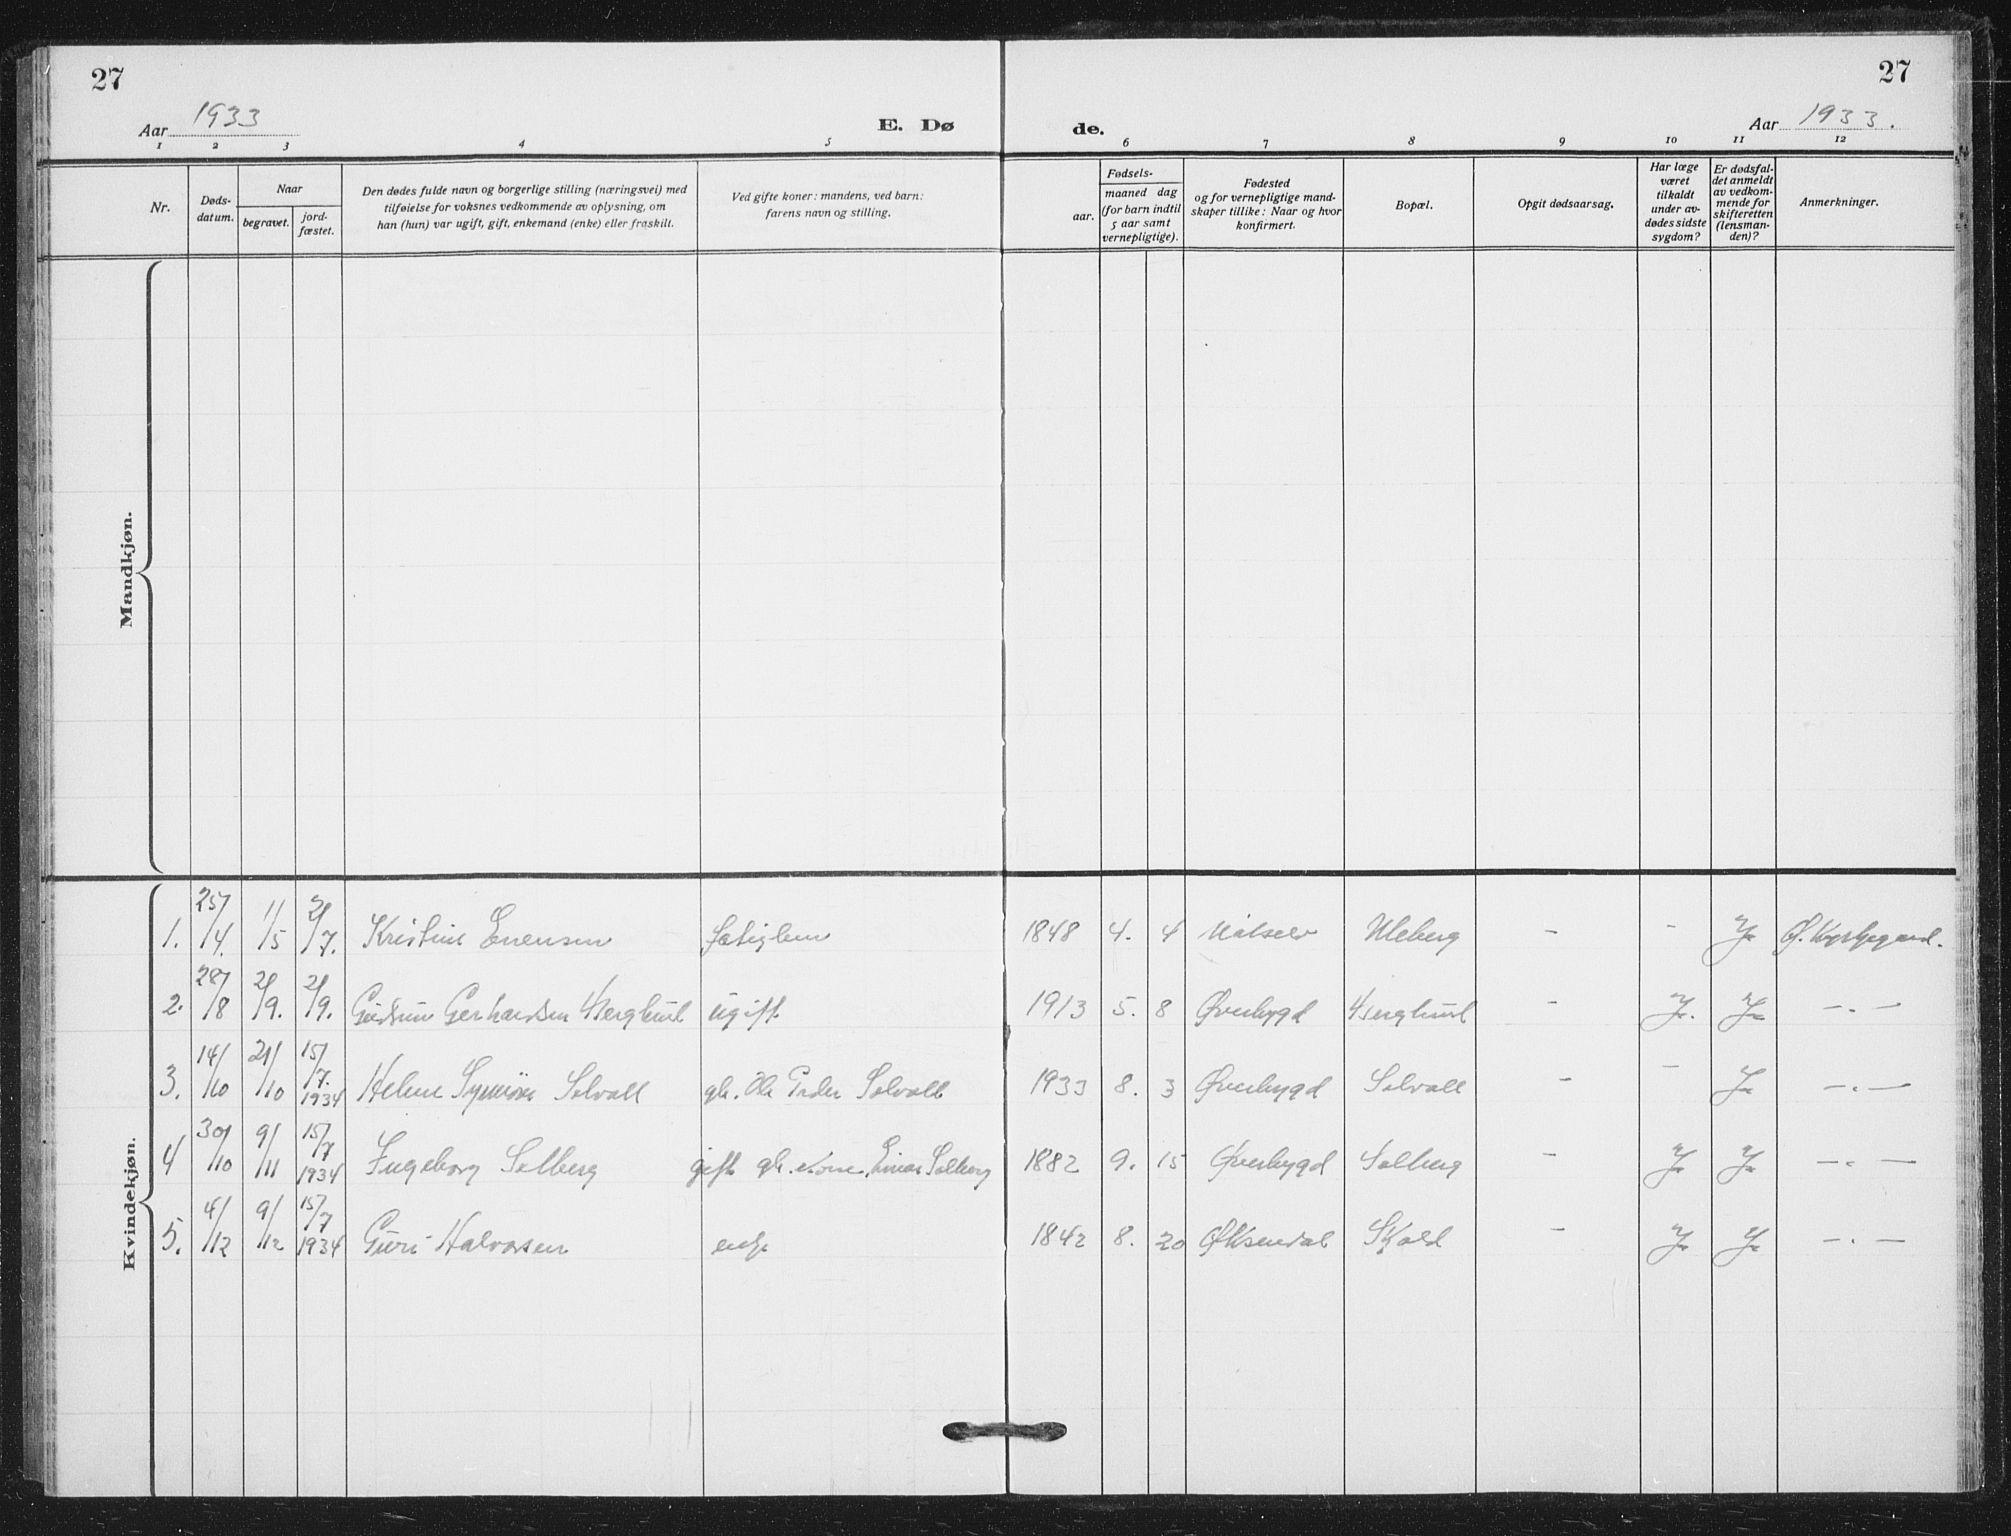 SATØ, Målselv sokneprestembete, G/Ga/Gab/L0012klokker: Klokkerbok nr. 12, 1900-1936, s. 27